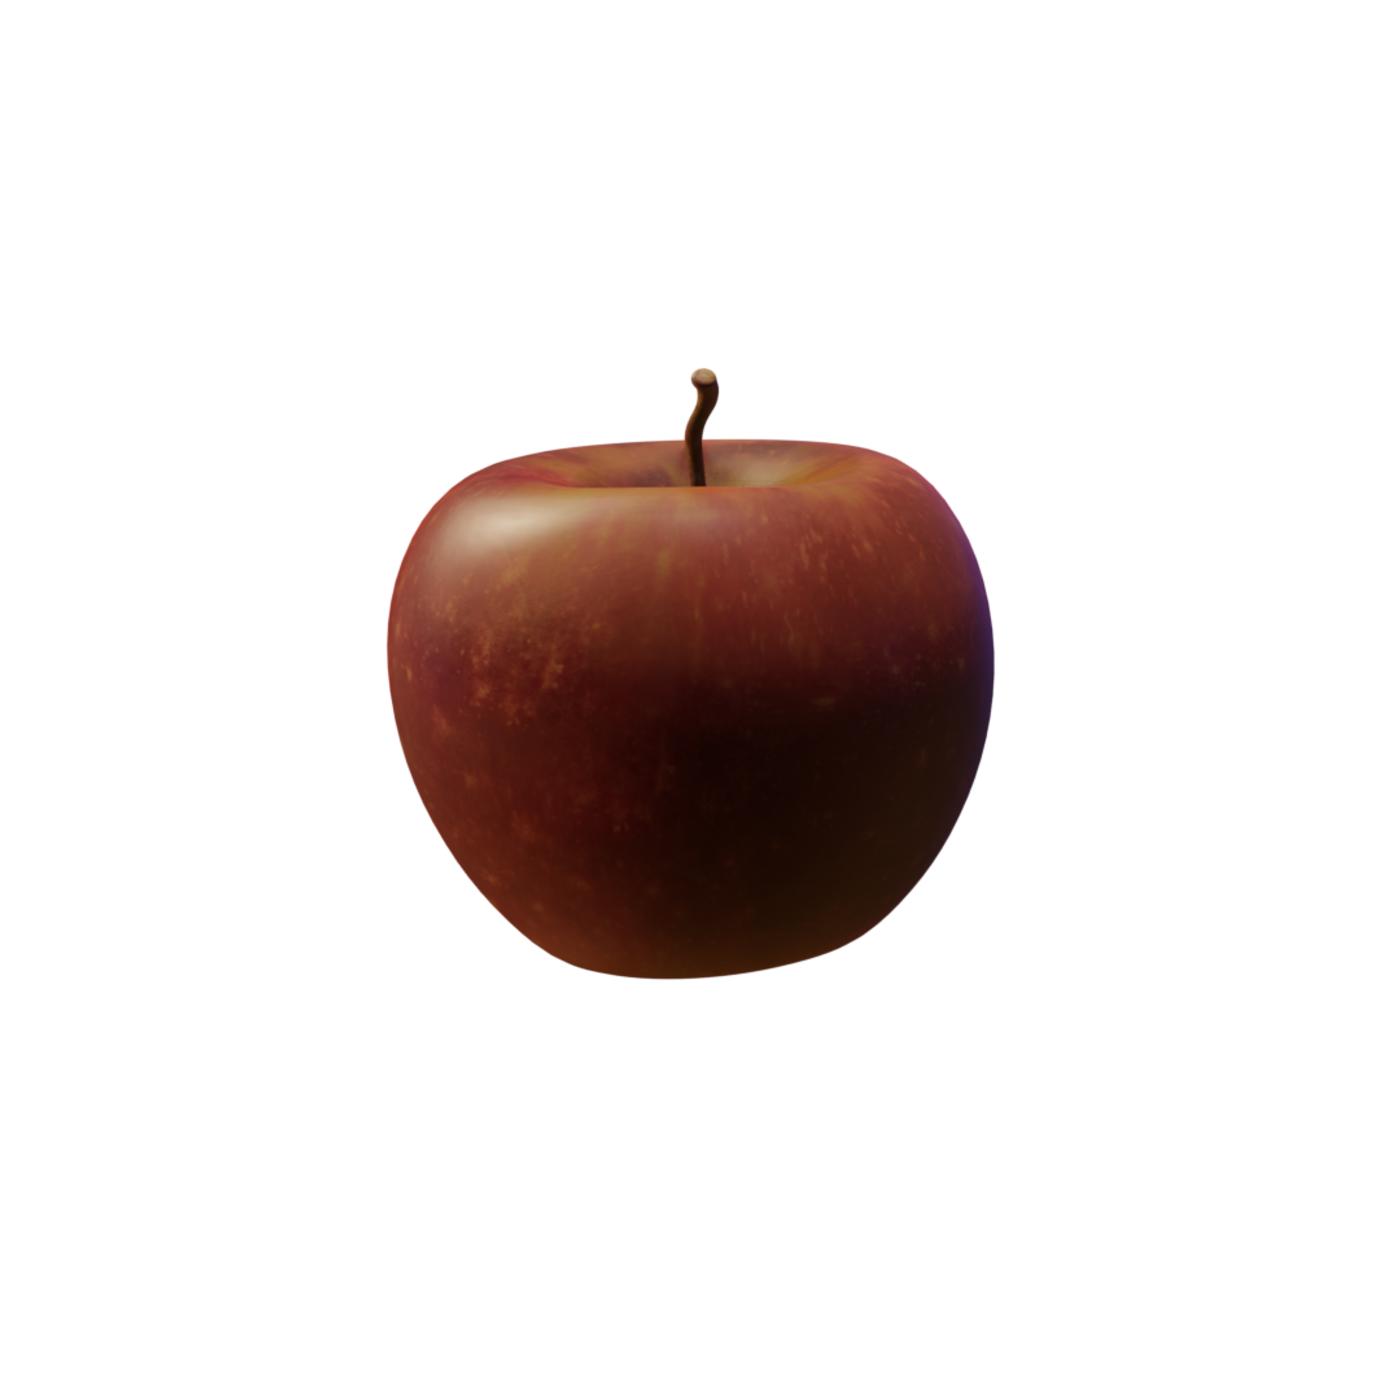 Apple (blender 2.8) for sale!